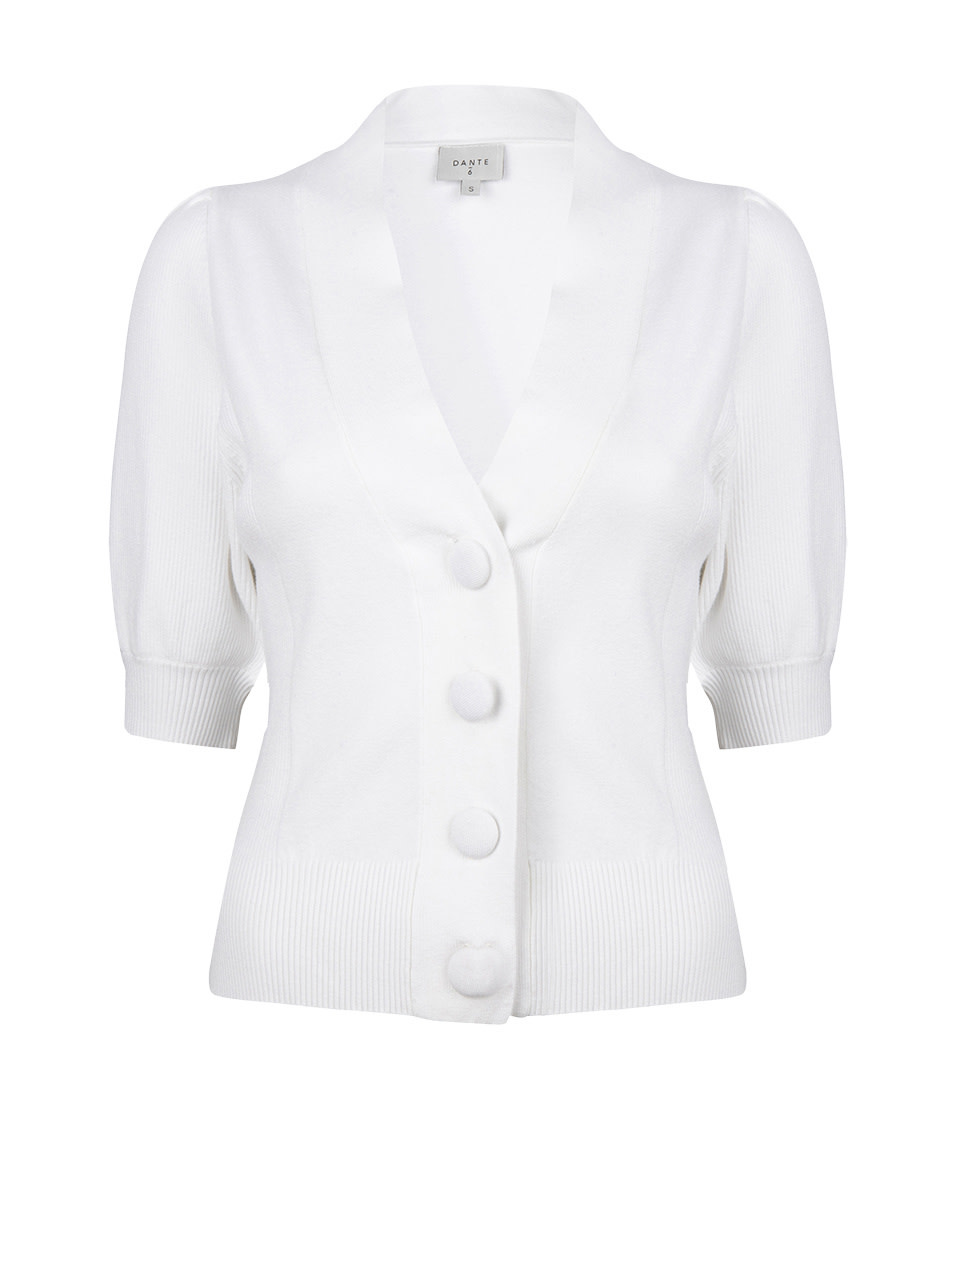 rosi cardigan optic white-1